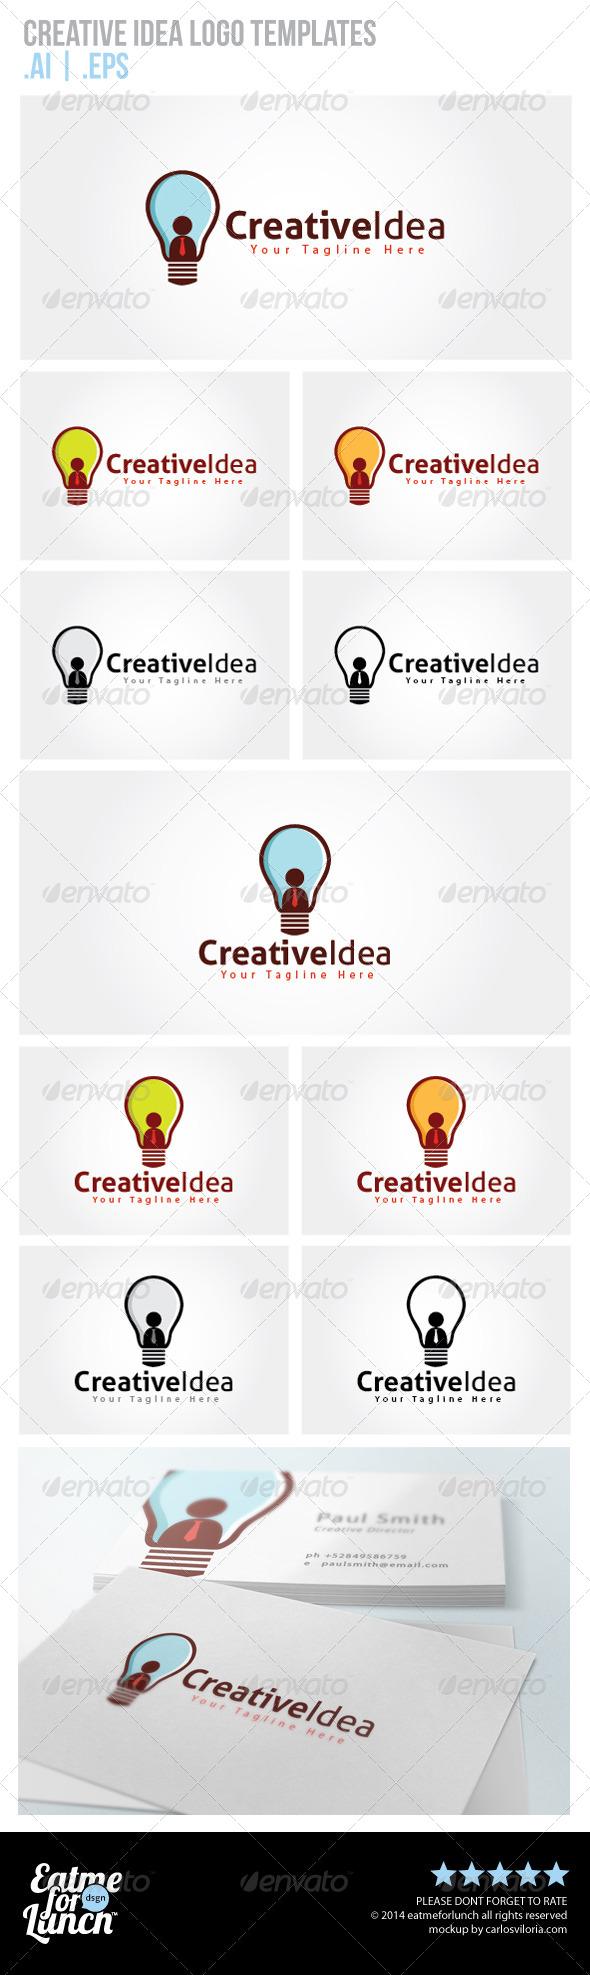 Creative Idea Logo Templates - Objects Logo Templates